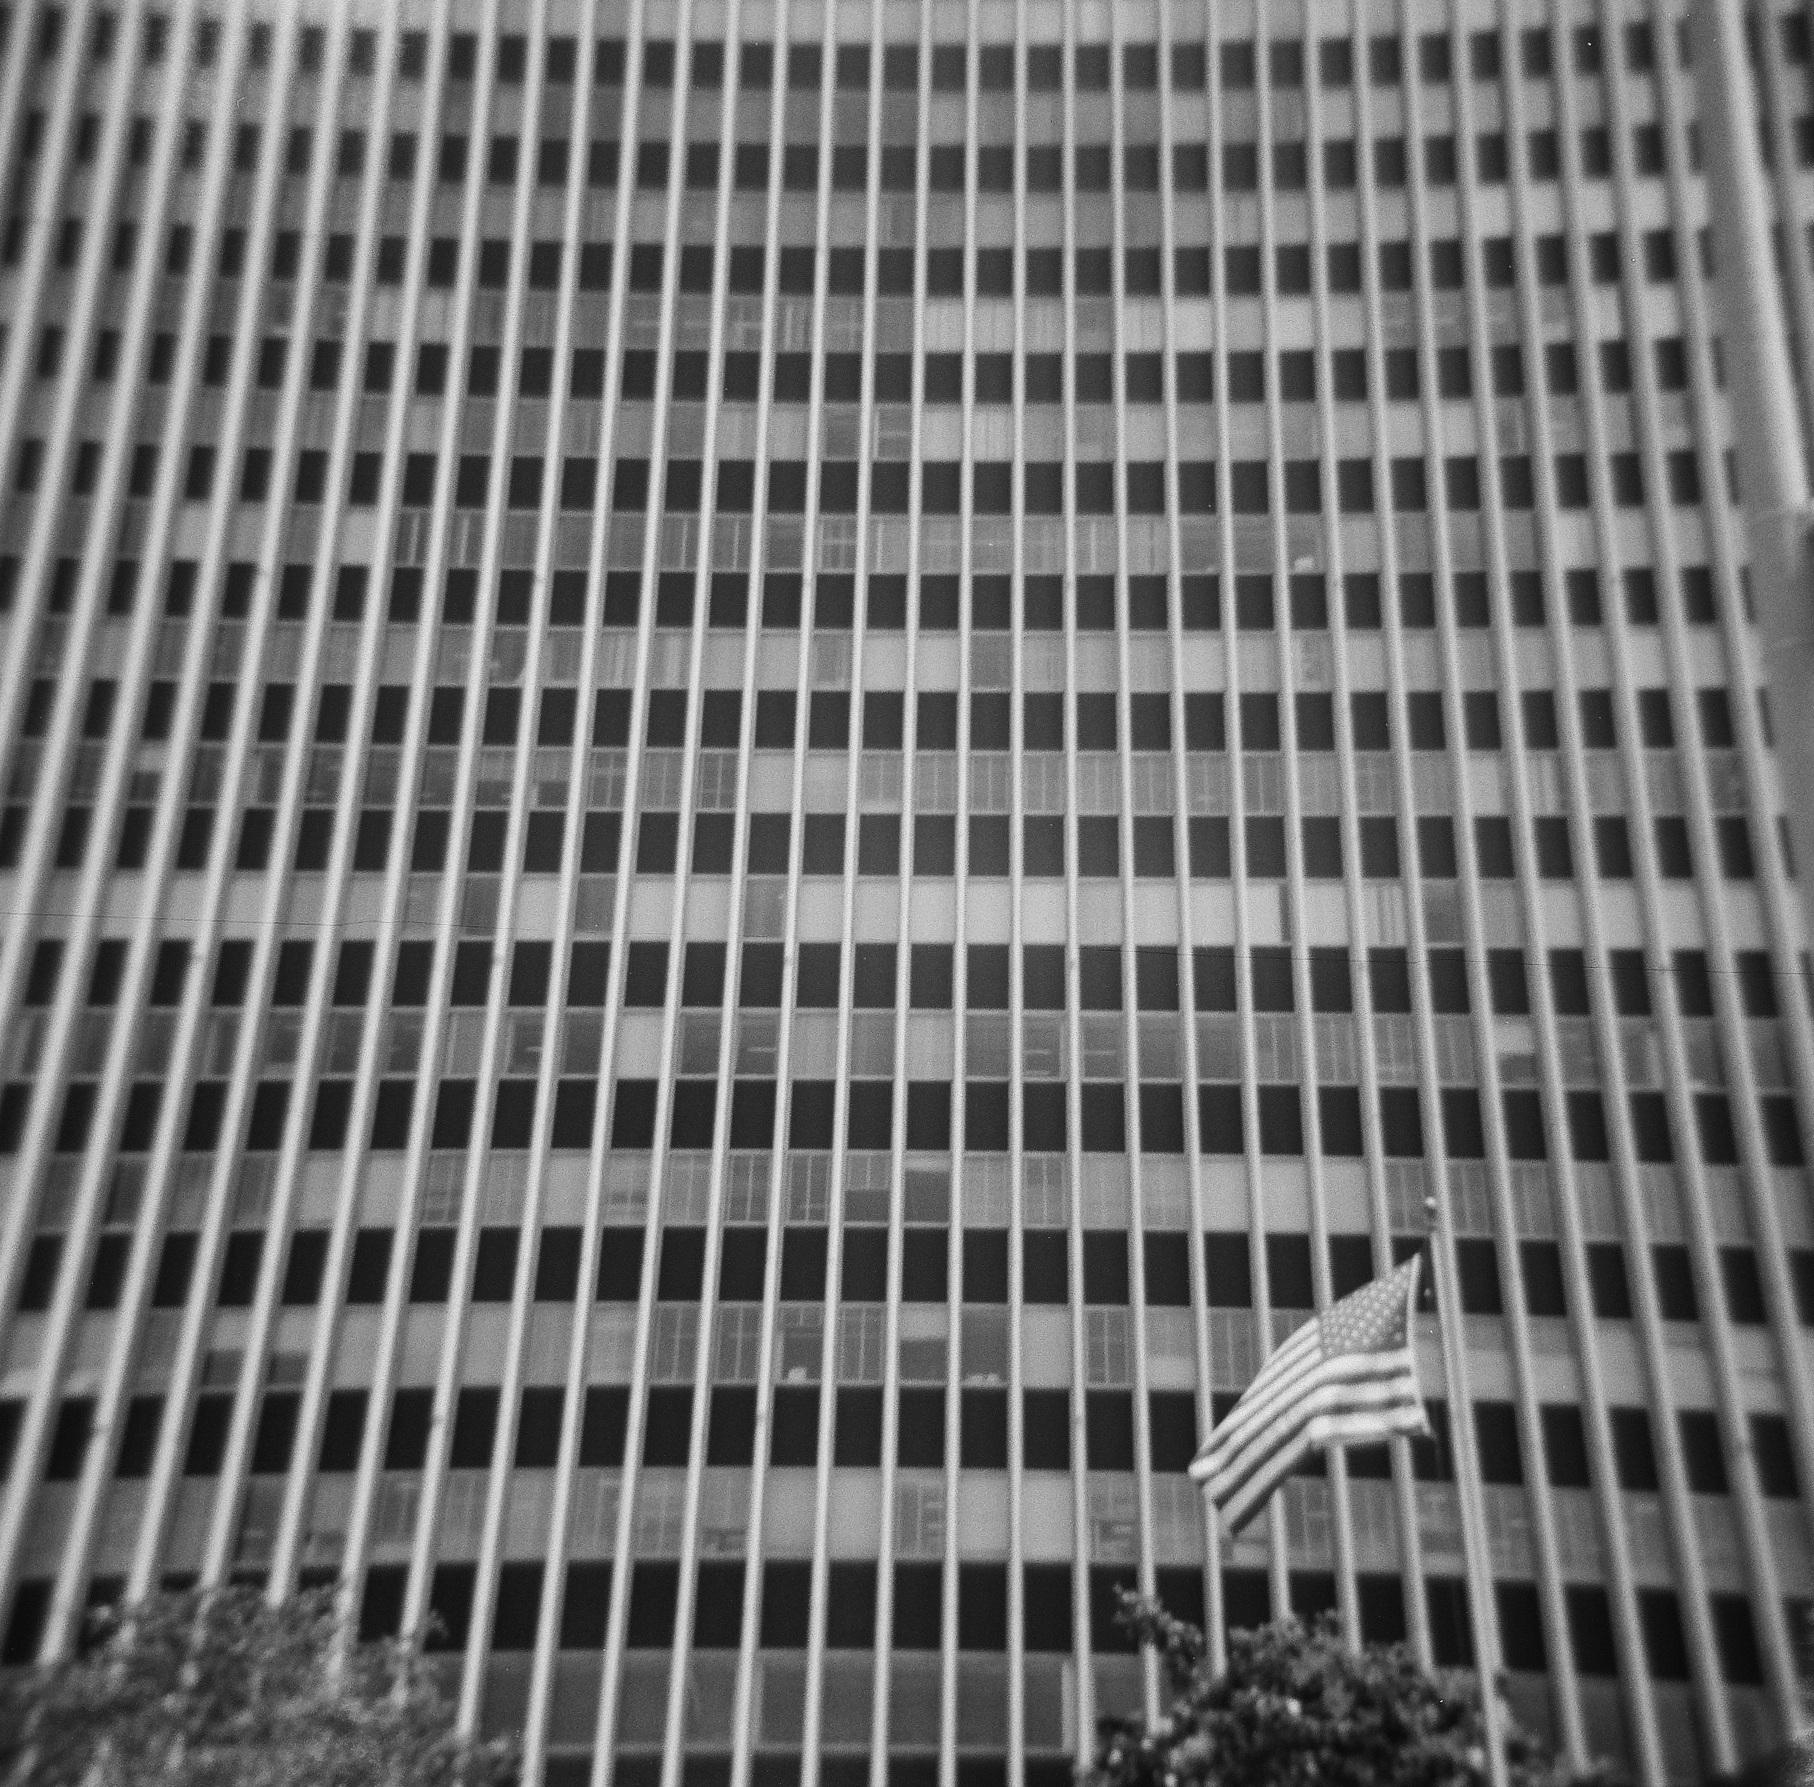 Federal Building in Los Angeles